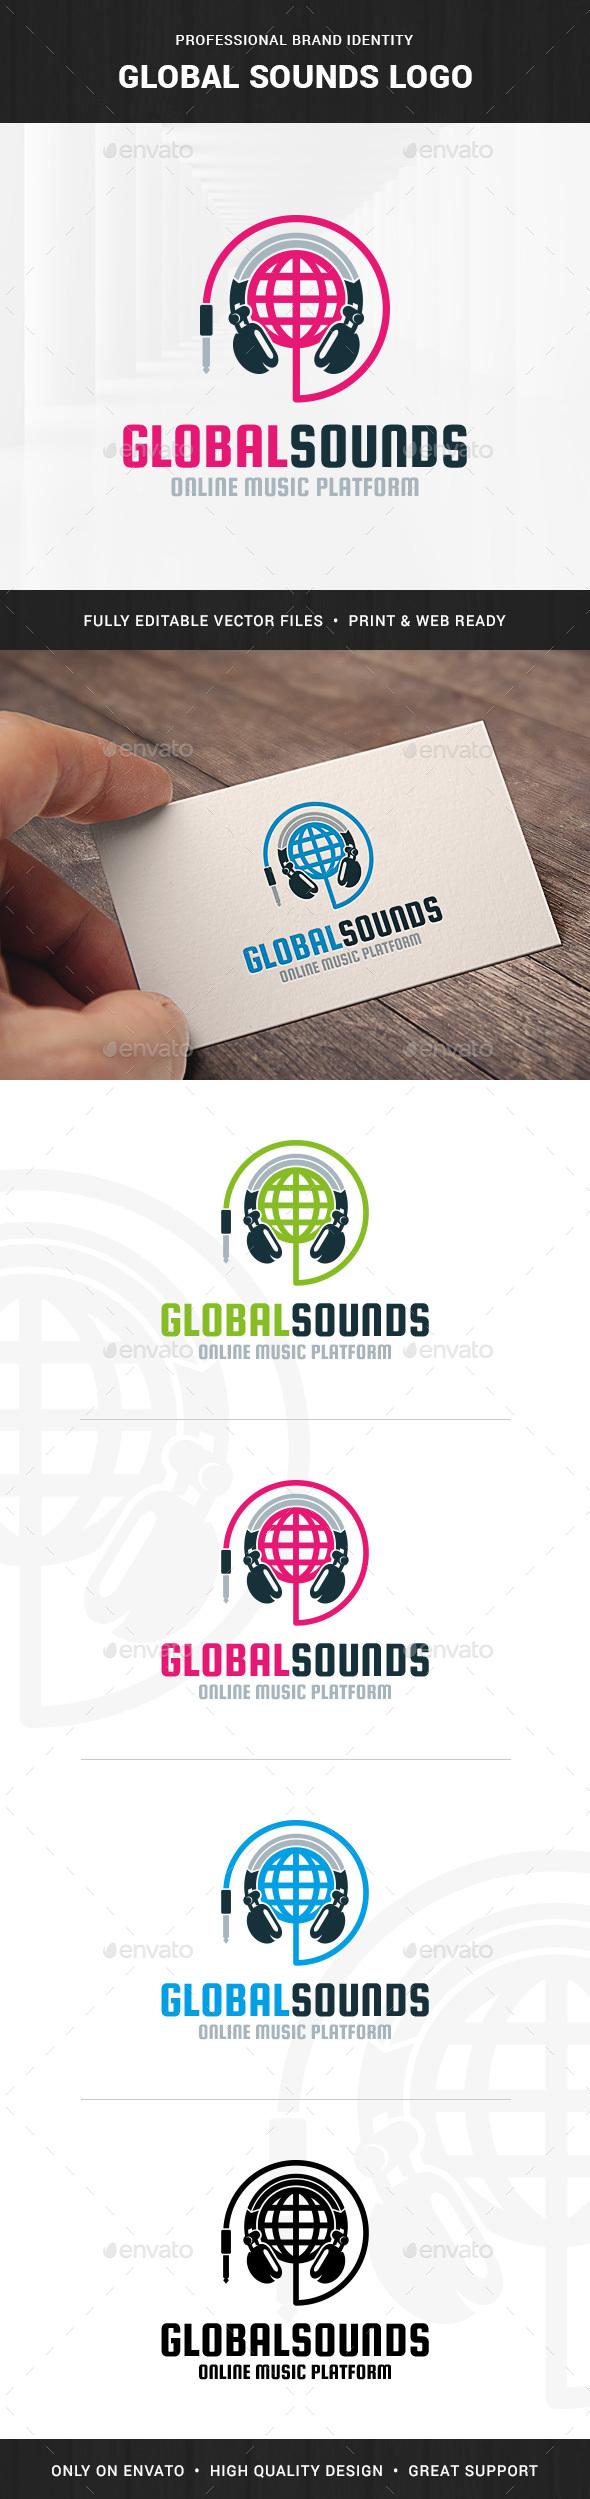 Global Sounds Logo Template